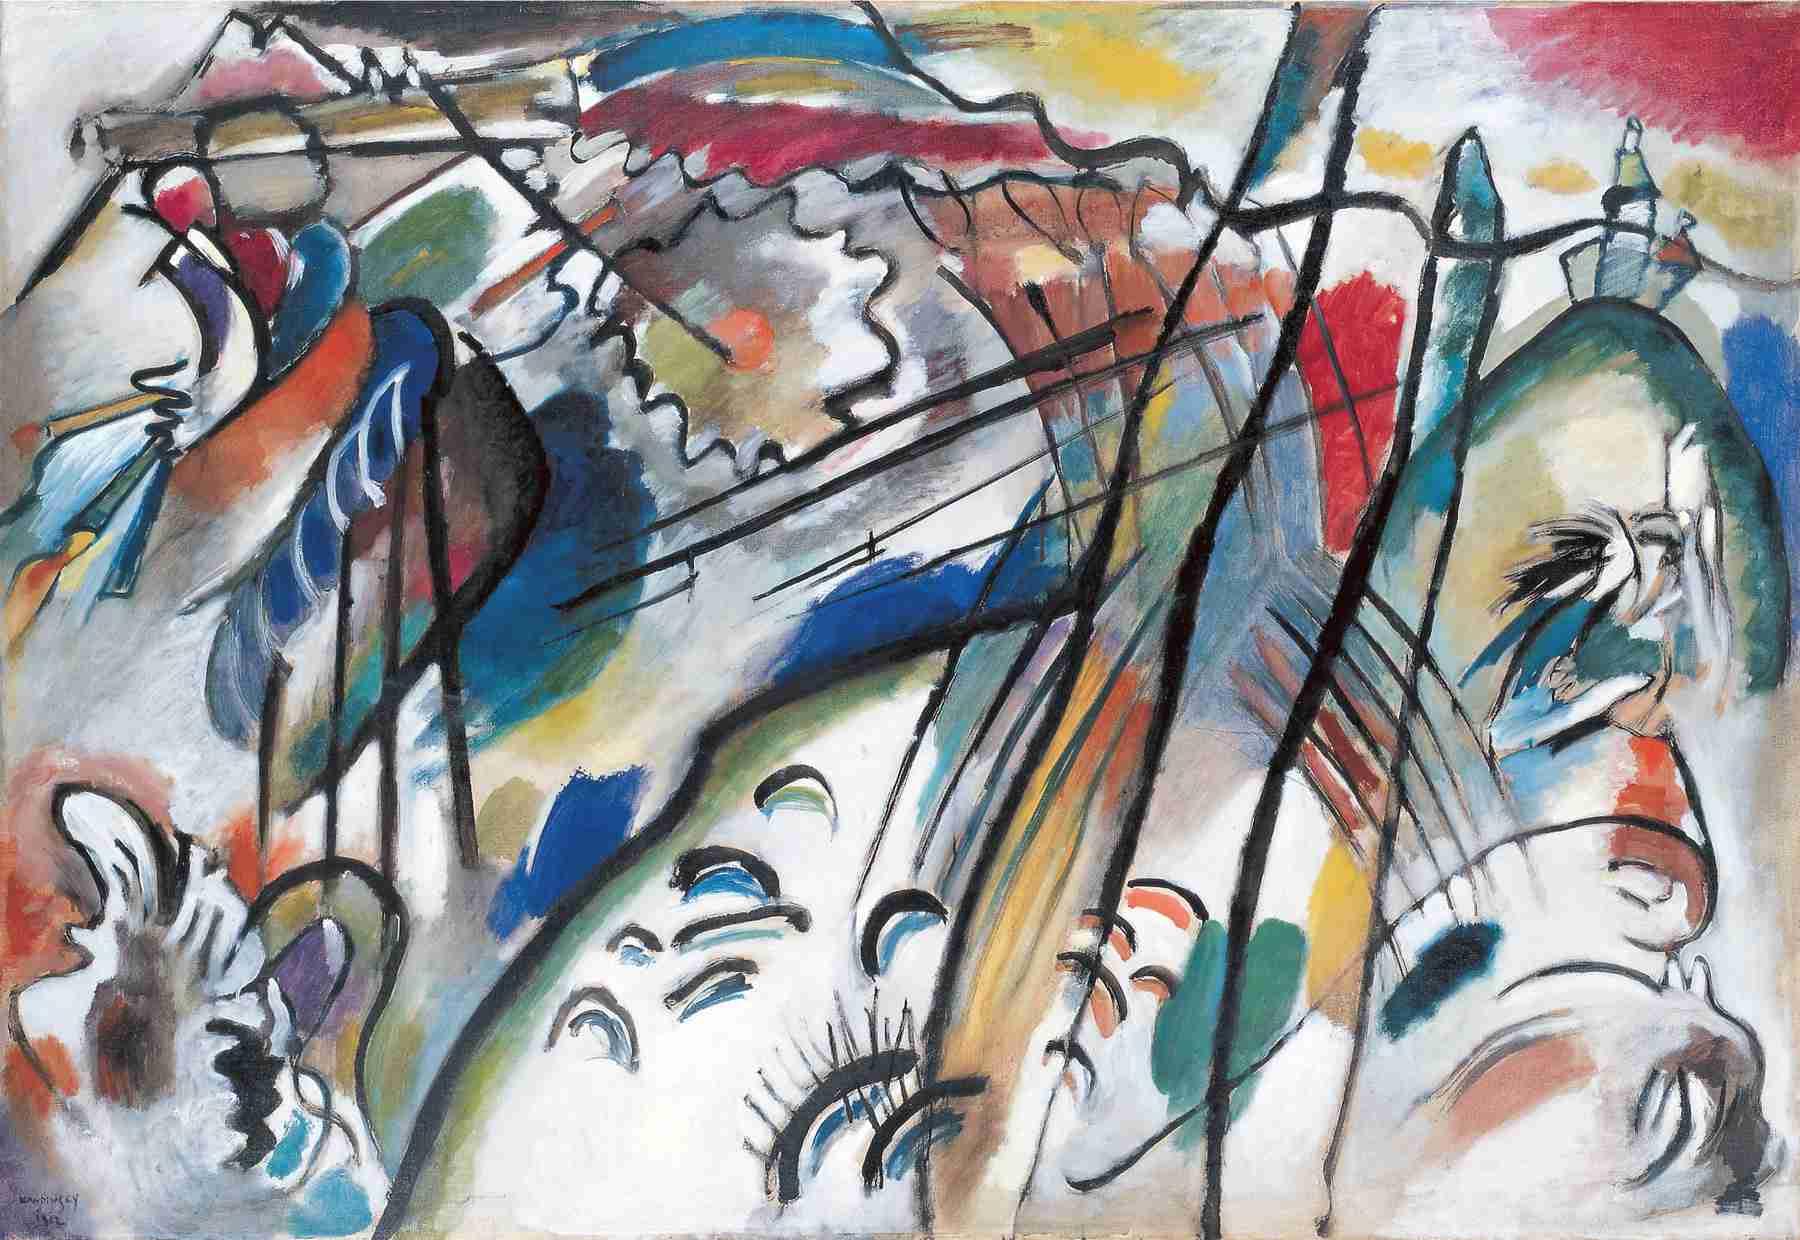 Wassily Kandinsky (Russian, 1866-1944) Wassily Kandinsky (Russian, 1866-1944). Improvisation 28 (second version) (Improvisation 28 [zweite Fassung]), 1912. Oil on canvas. 43 7/8 x 63 7/8 in. (111.4 x 162.1 cm). Solomon R. Guggenheim Founding Collection, By gift 37.239.